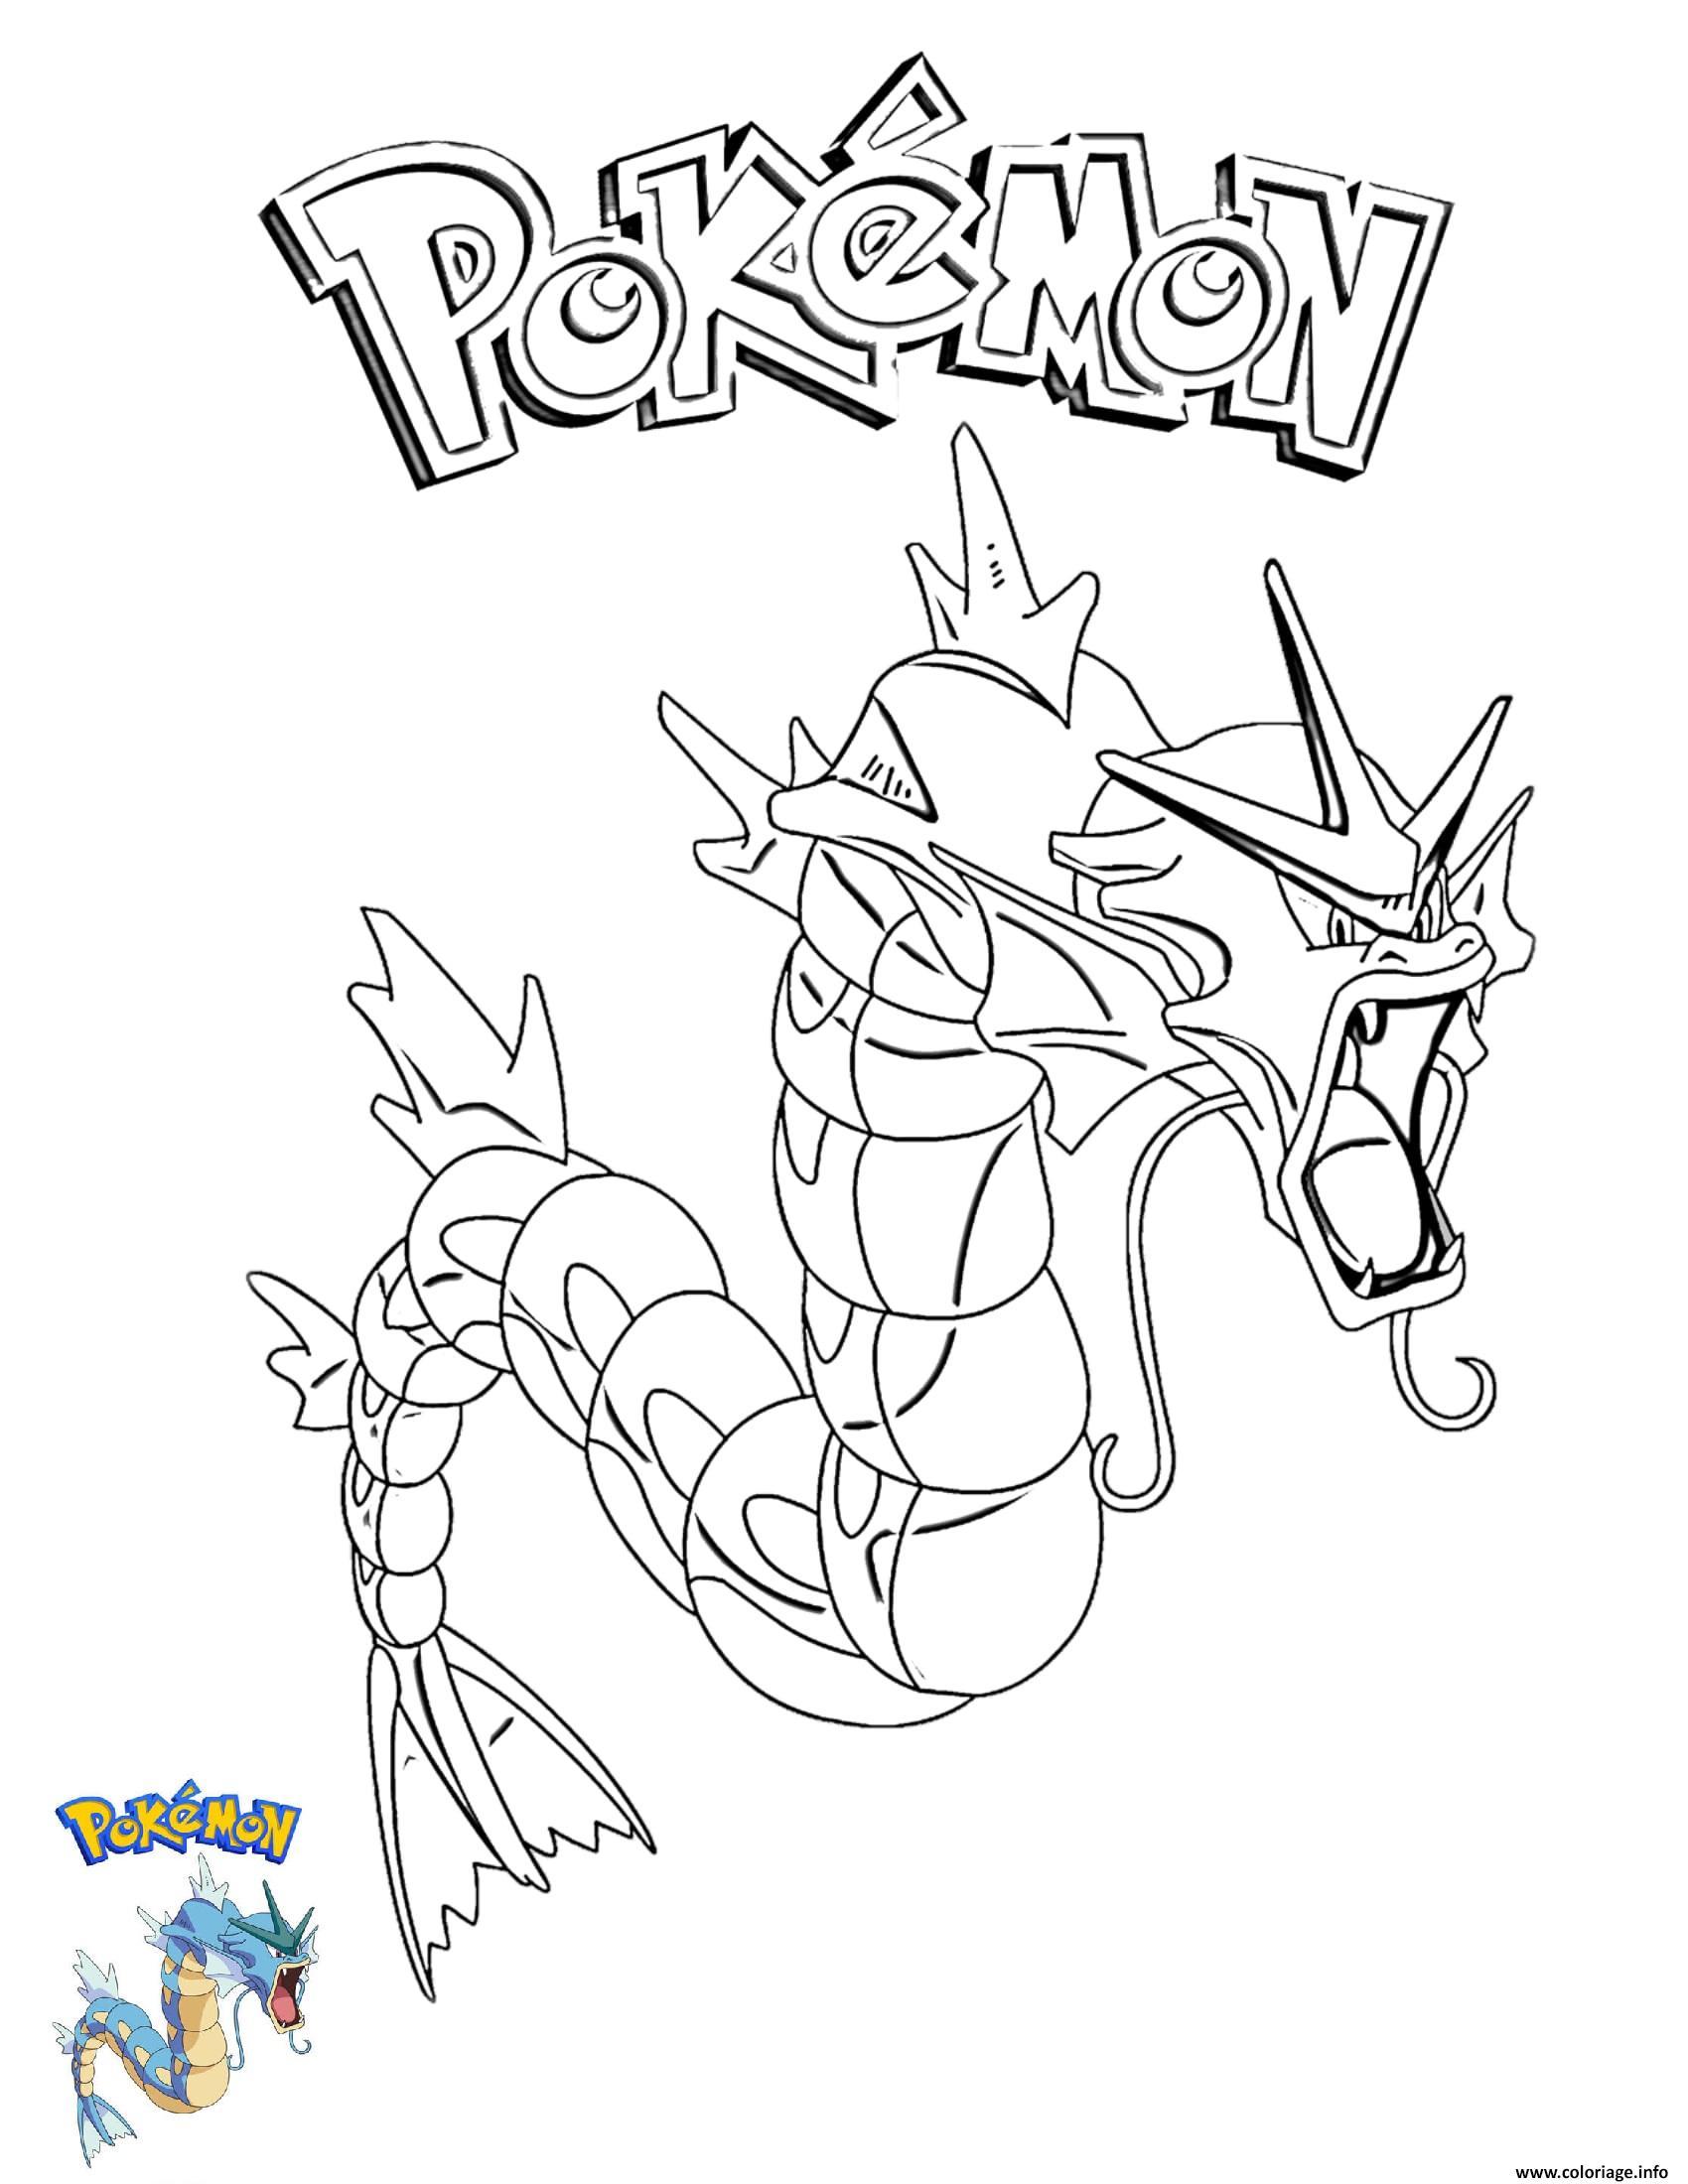 Dessin Gyarados Pokemon Coloriage Gratuit à Imprimer